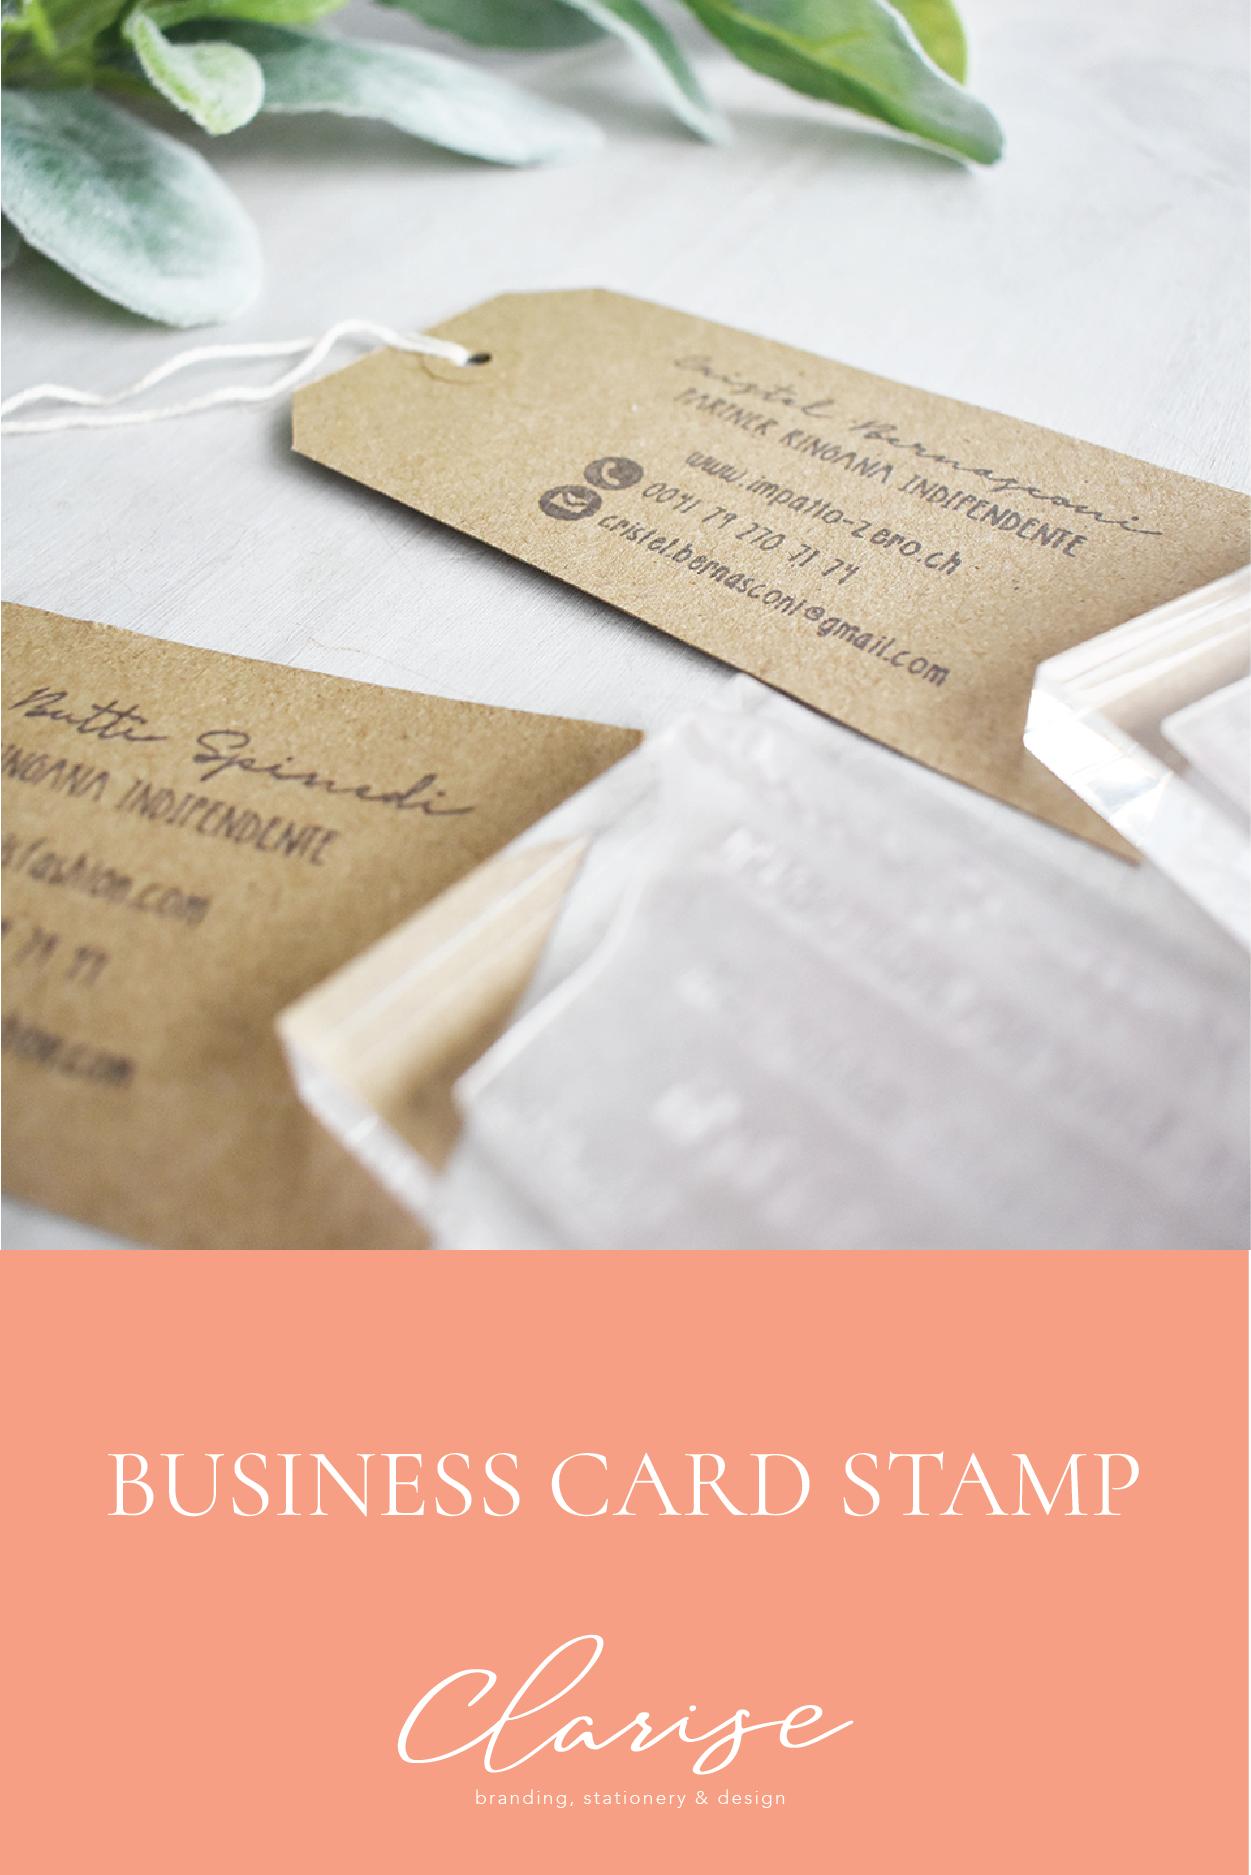 Custom Business Card Stamp Logo Stamp Businesscard Businessstamp Customestamp Business Stamps Business Logo Stamp Custom Business Cards